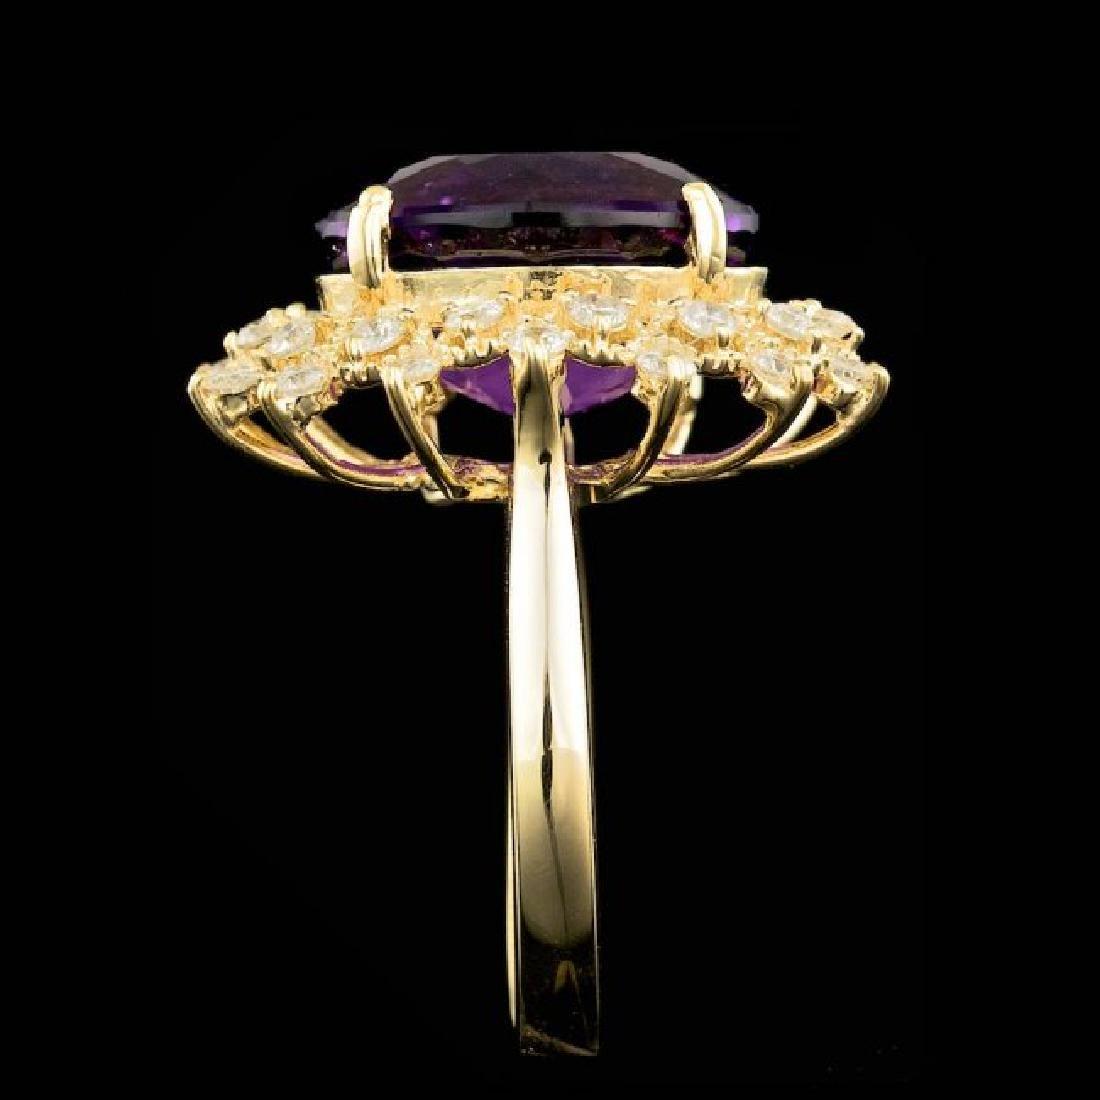 14k Gold 8.00ct Amethyst 0.80ct Diamond Ring - 4